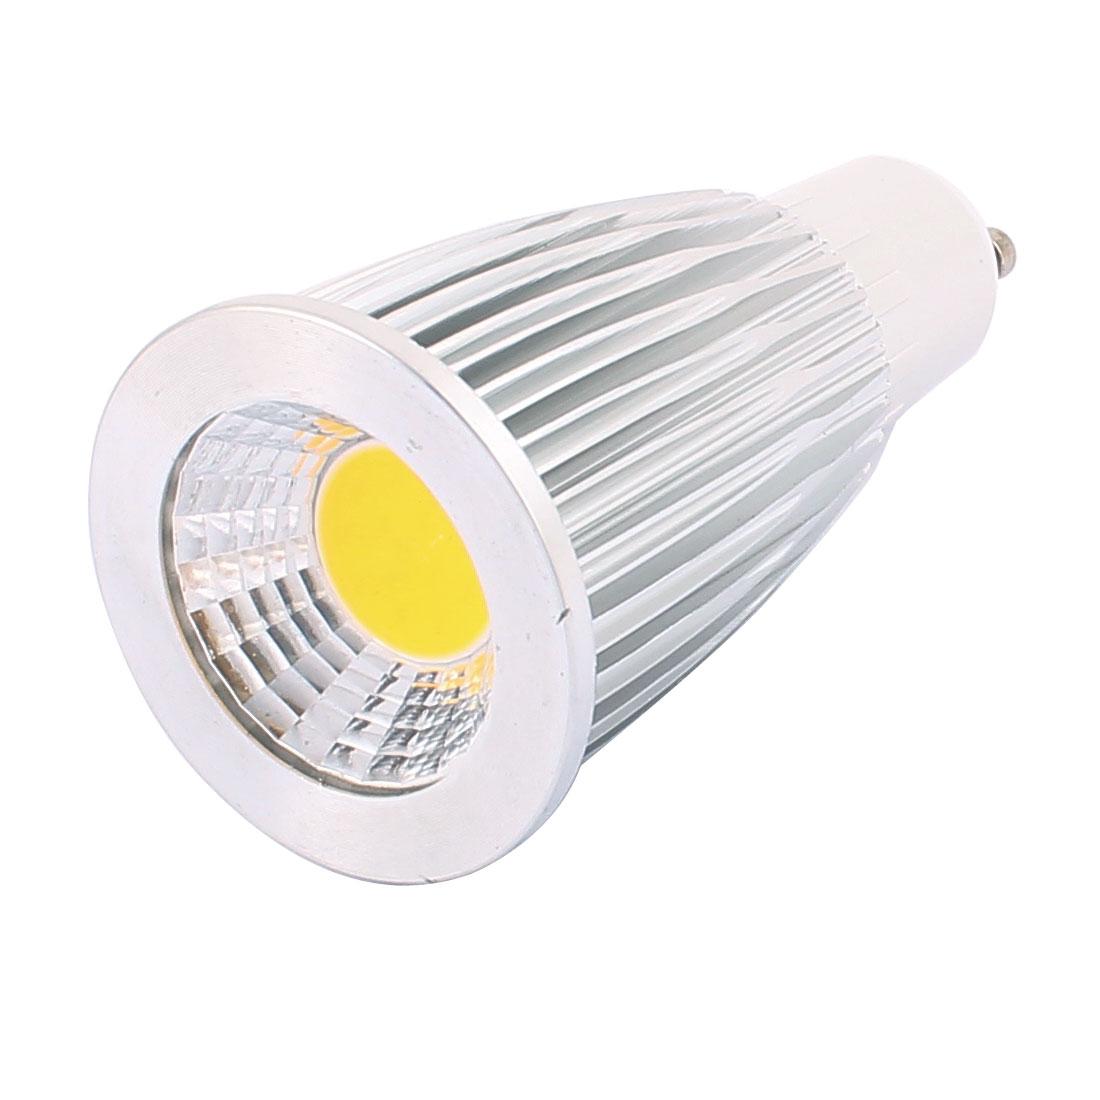 AC85-265V 7W GU10 COB LED Spotlight Lamp Bulb Energy Saving Downlight Pure White